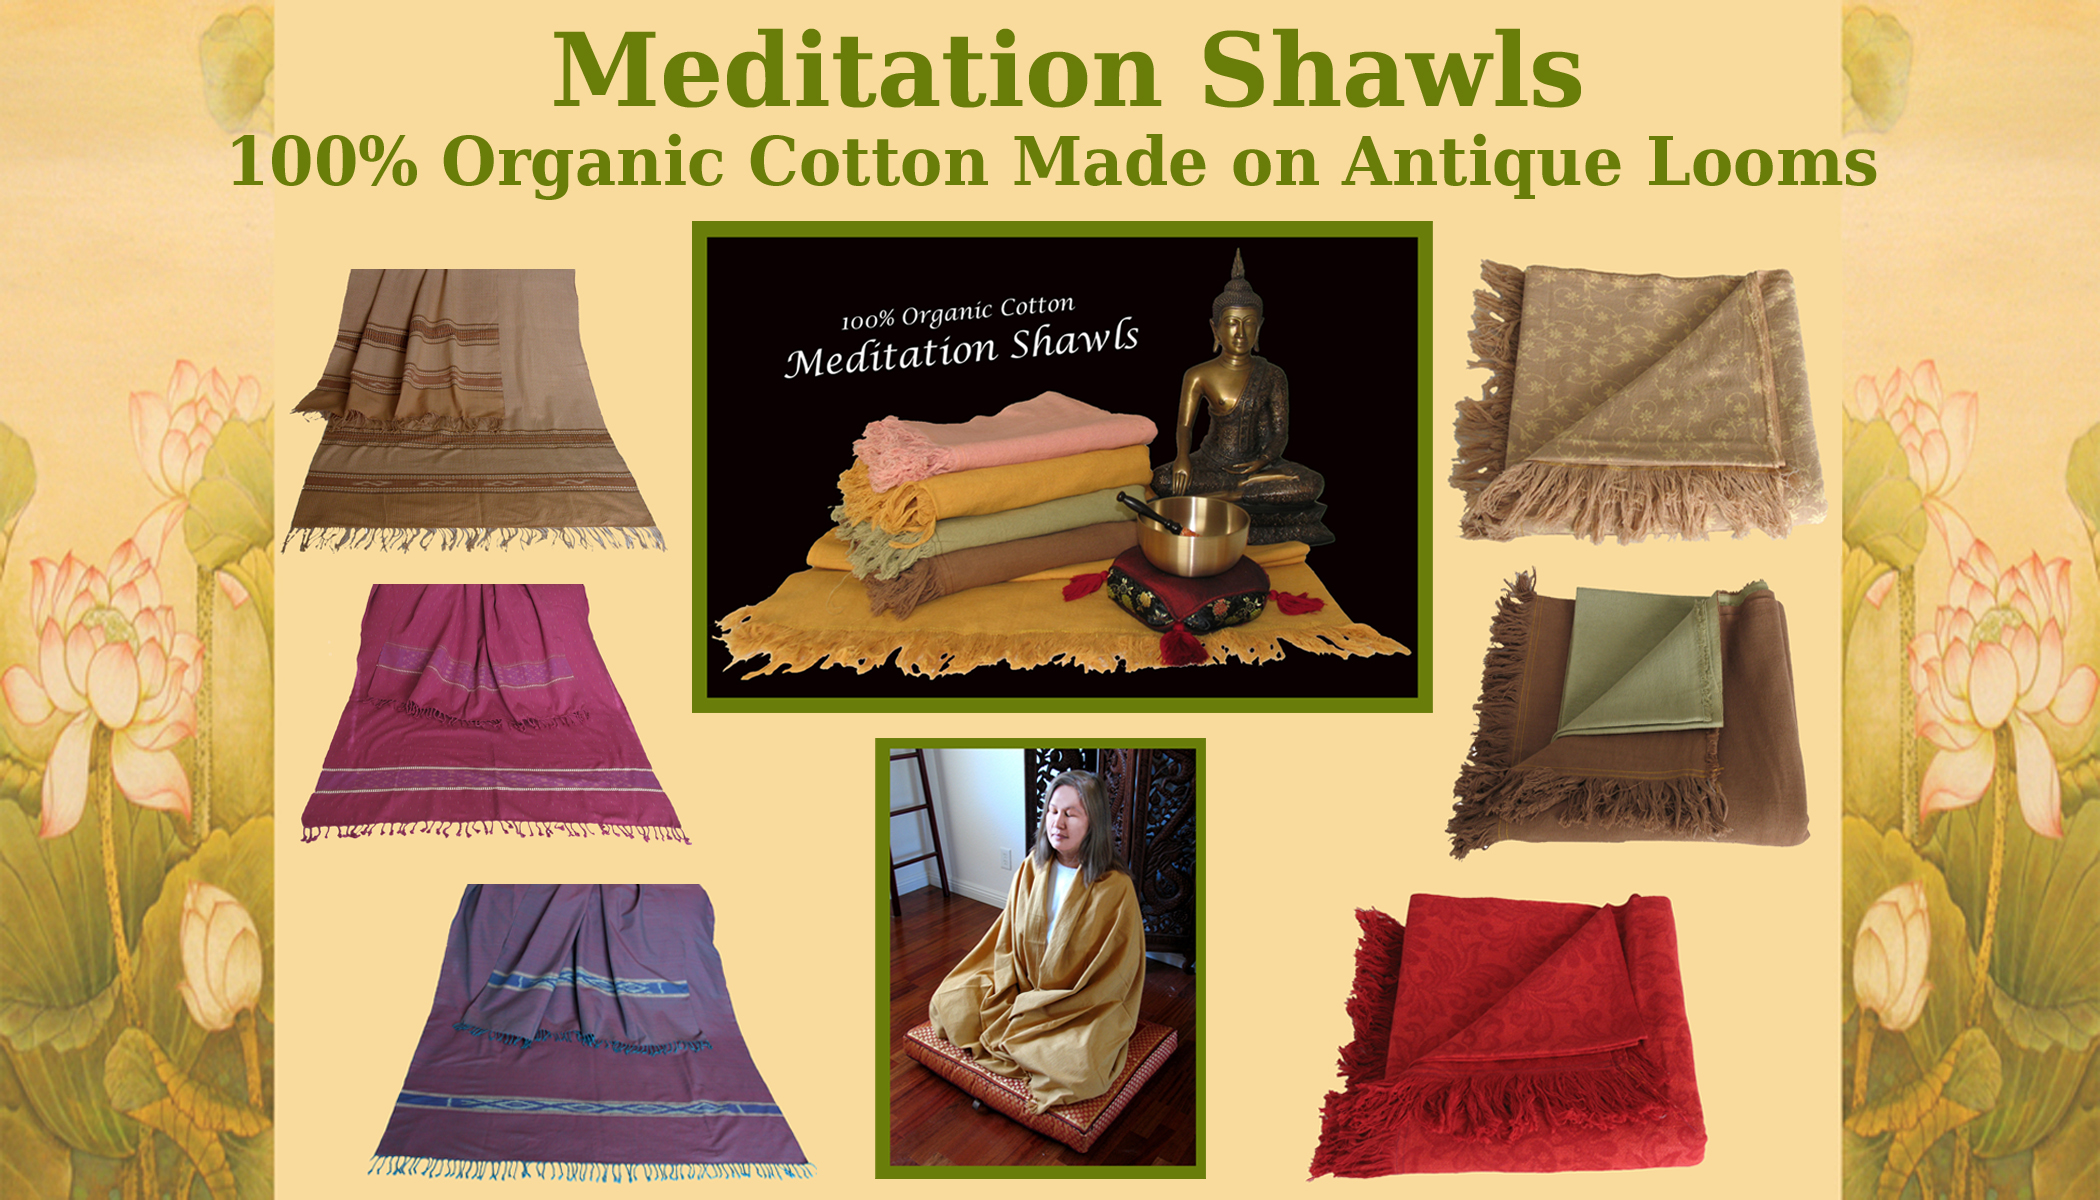 meditation-shawls-web.jpg